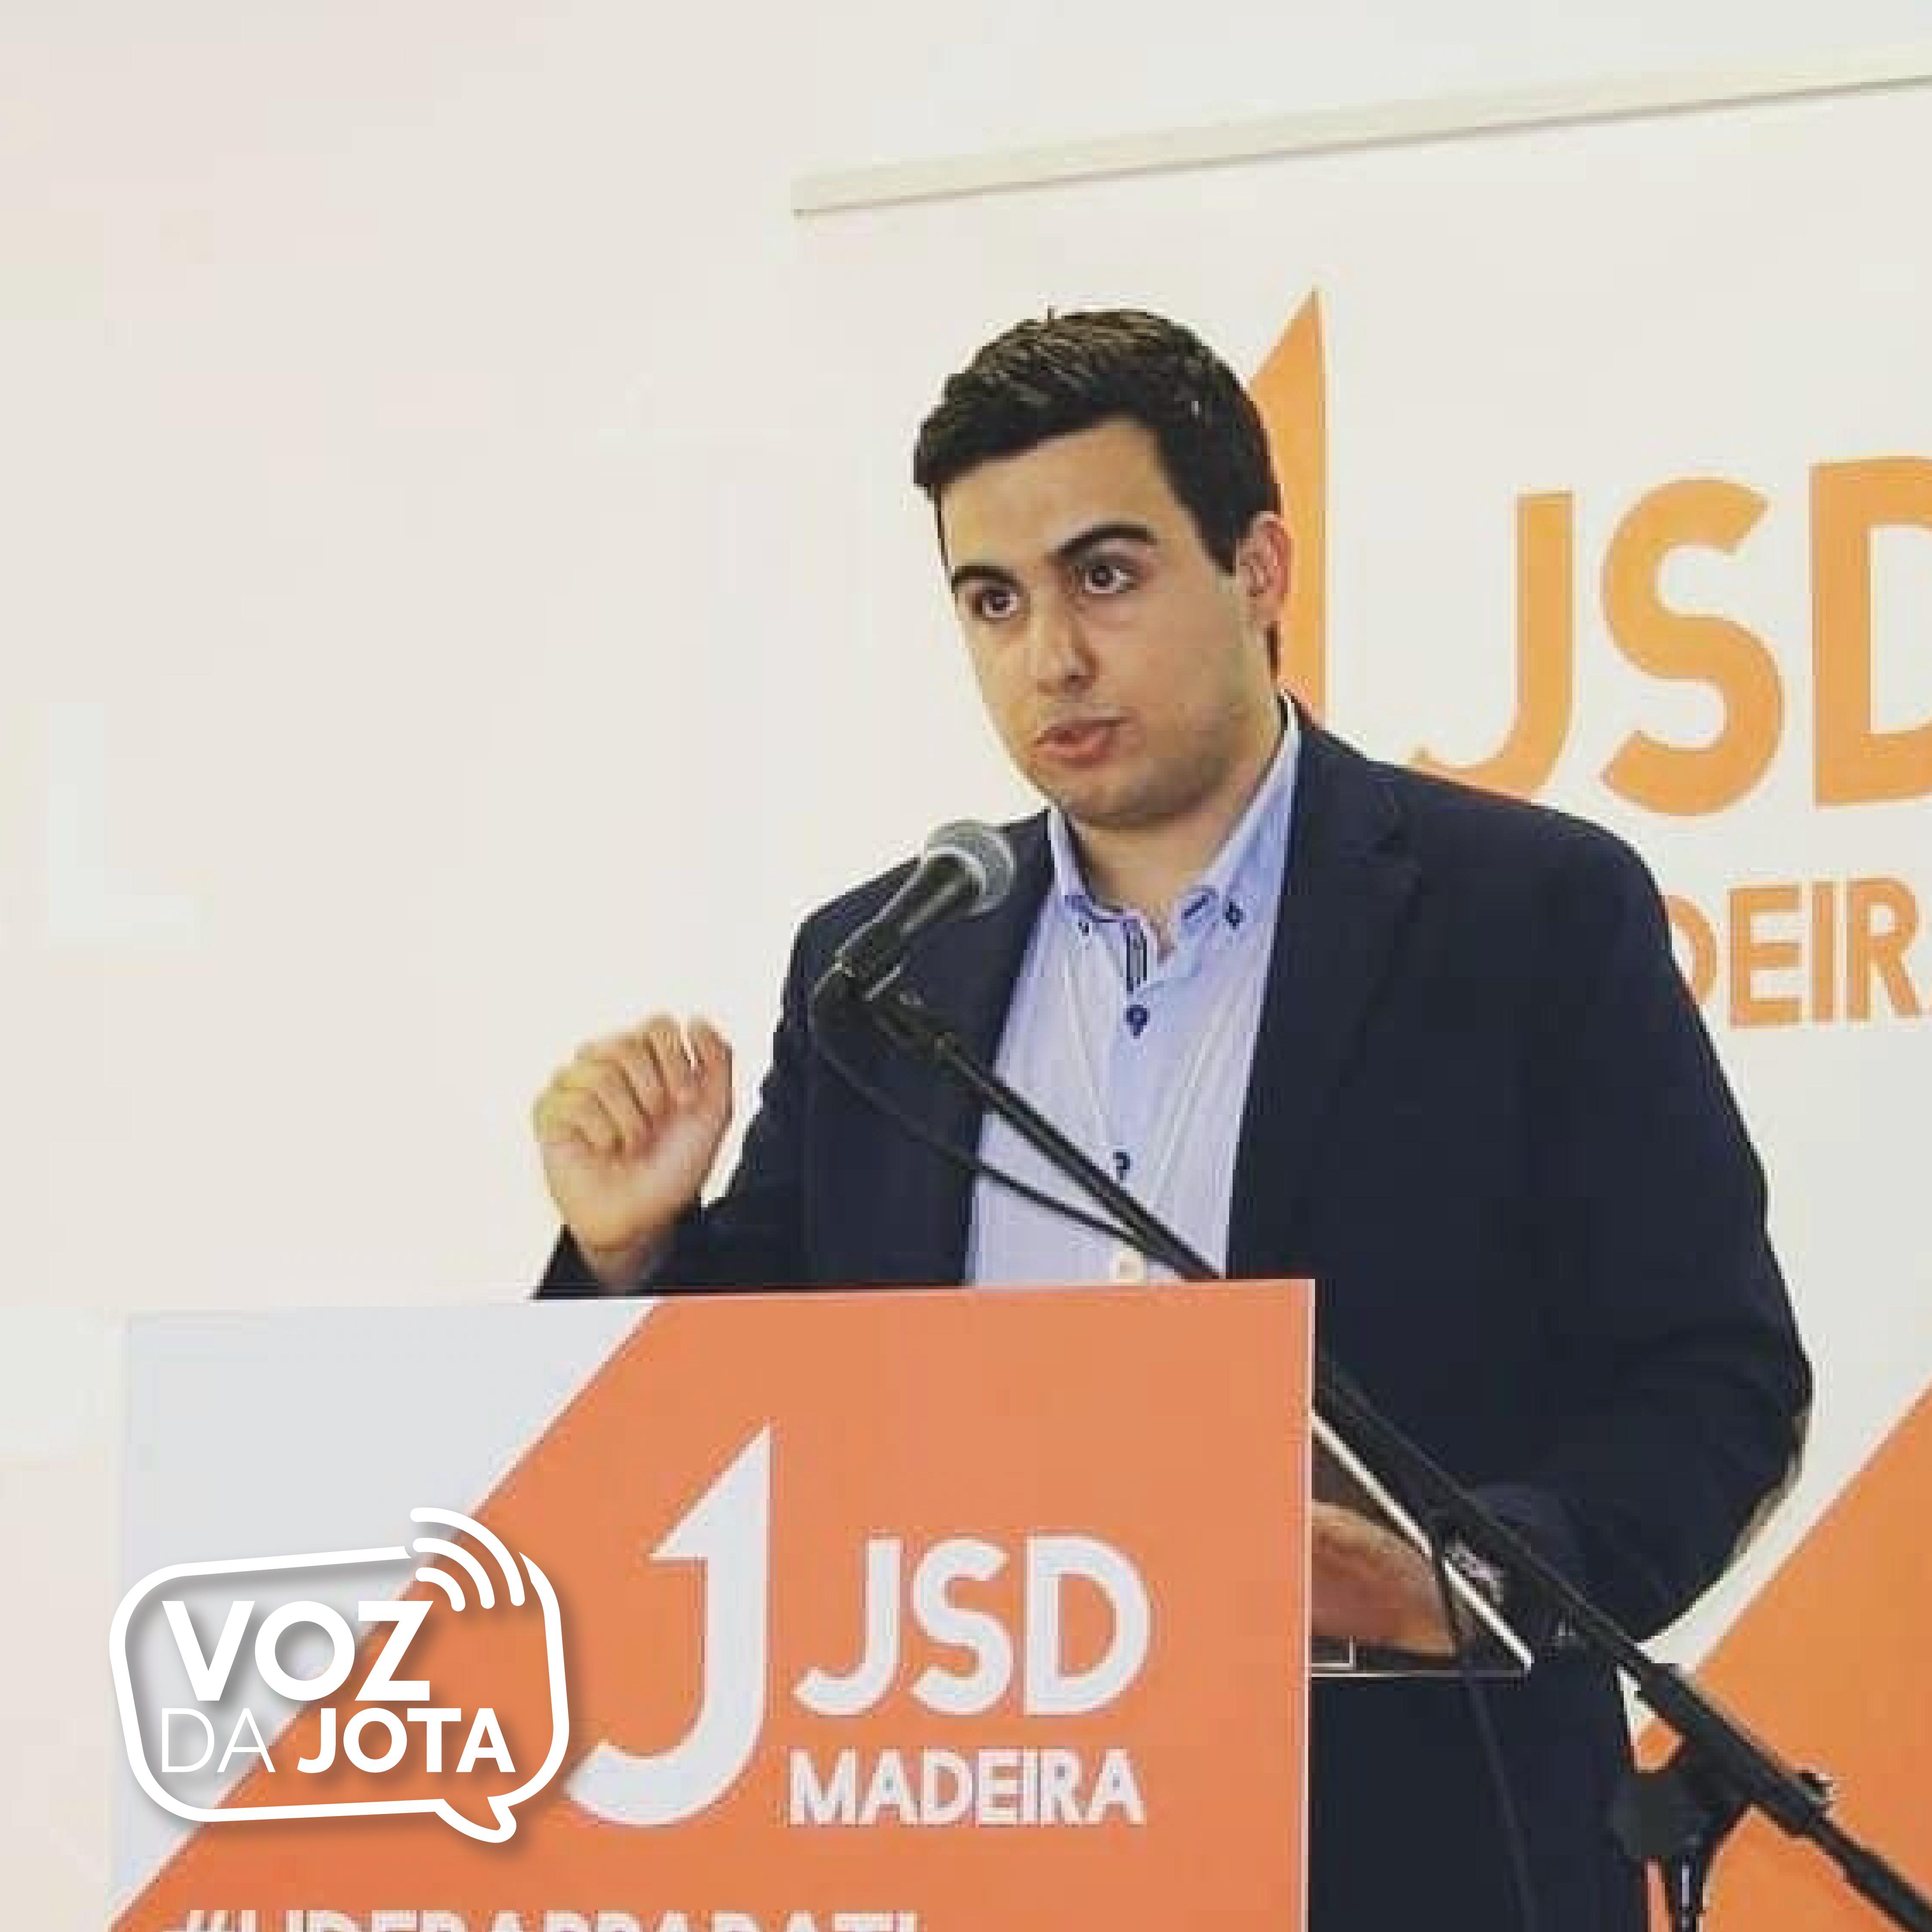 Pedro_Ortelá_vozdajota_site